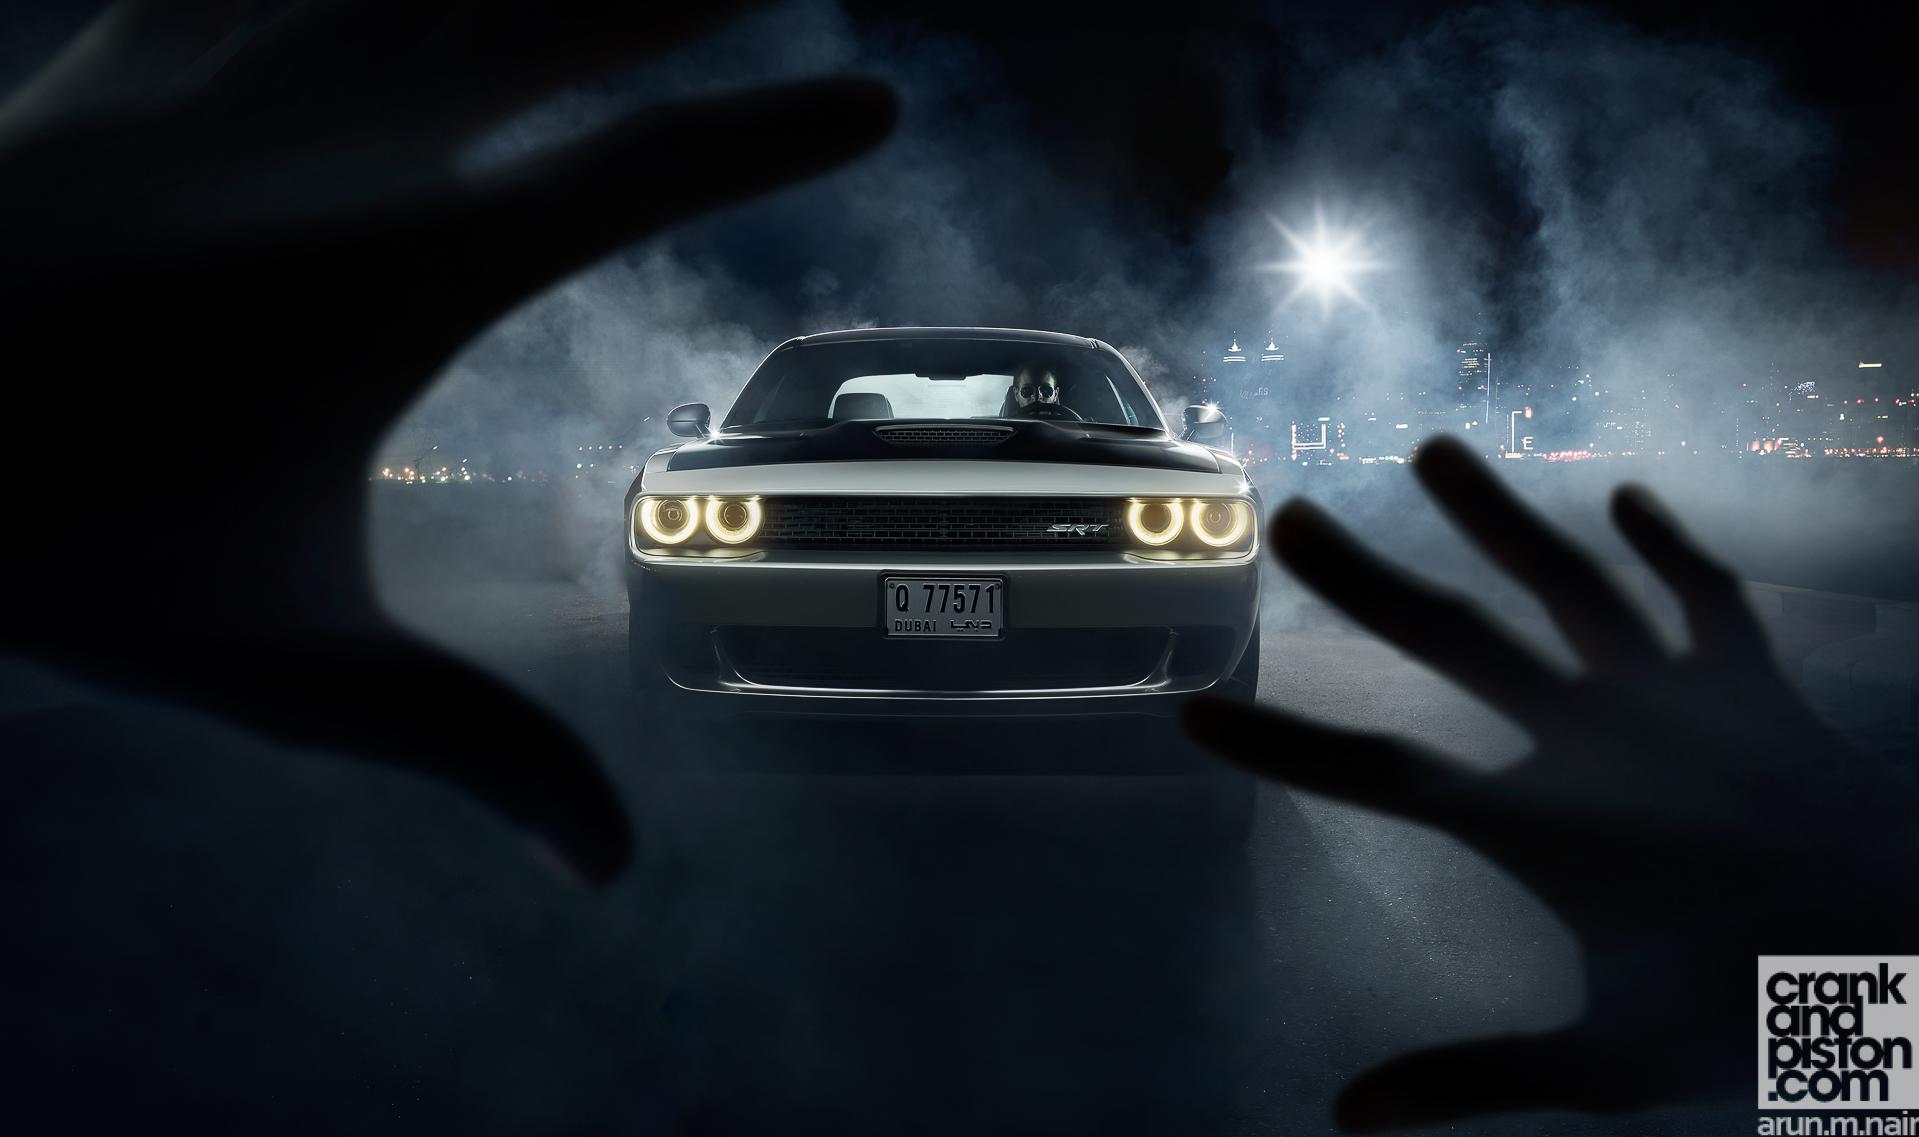 Dodge Challenger SRT Hellcat. Set 1 - crankandpiston.com